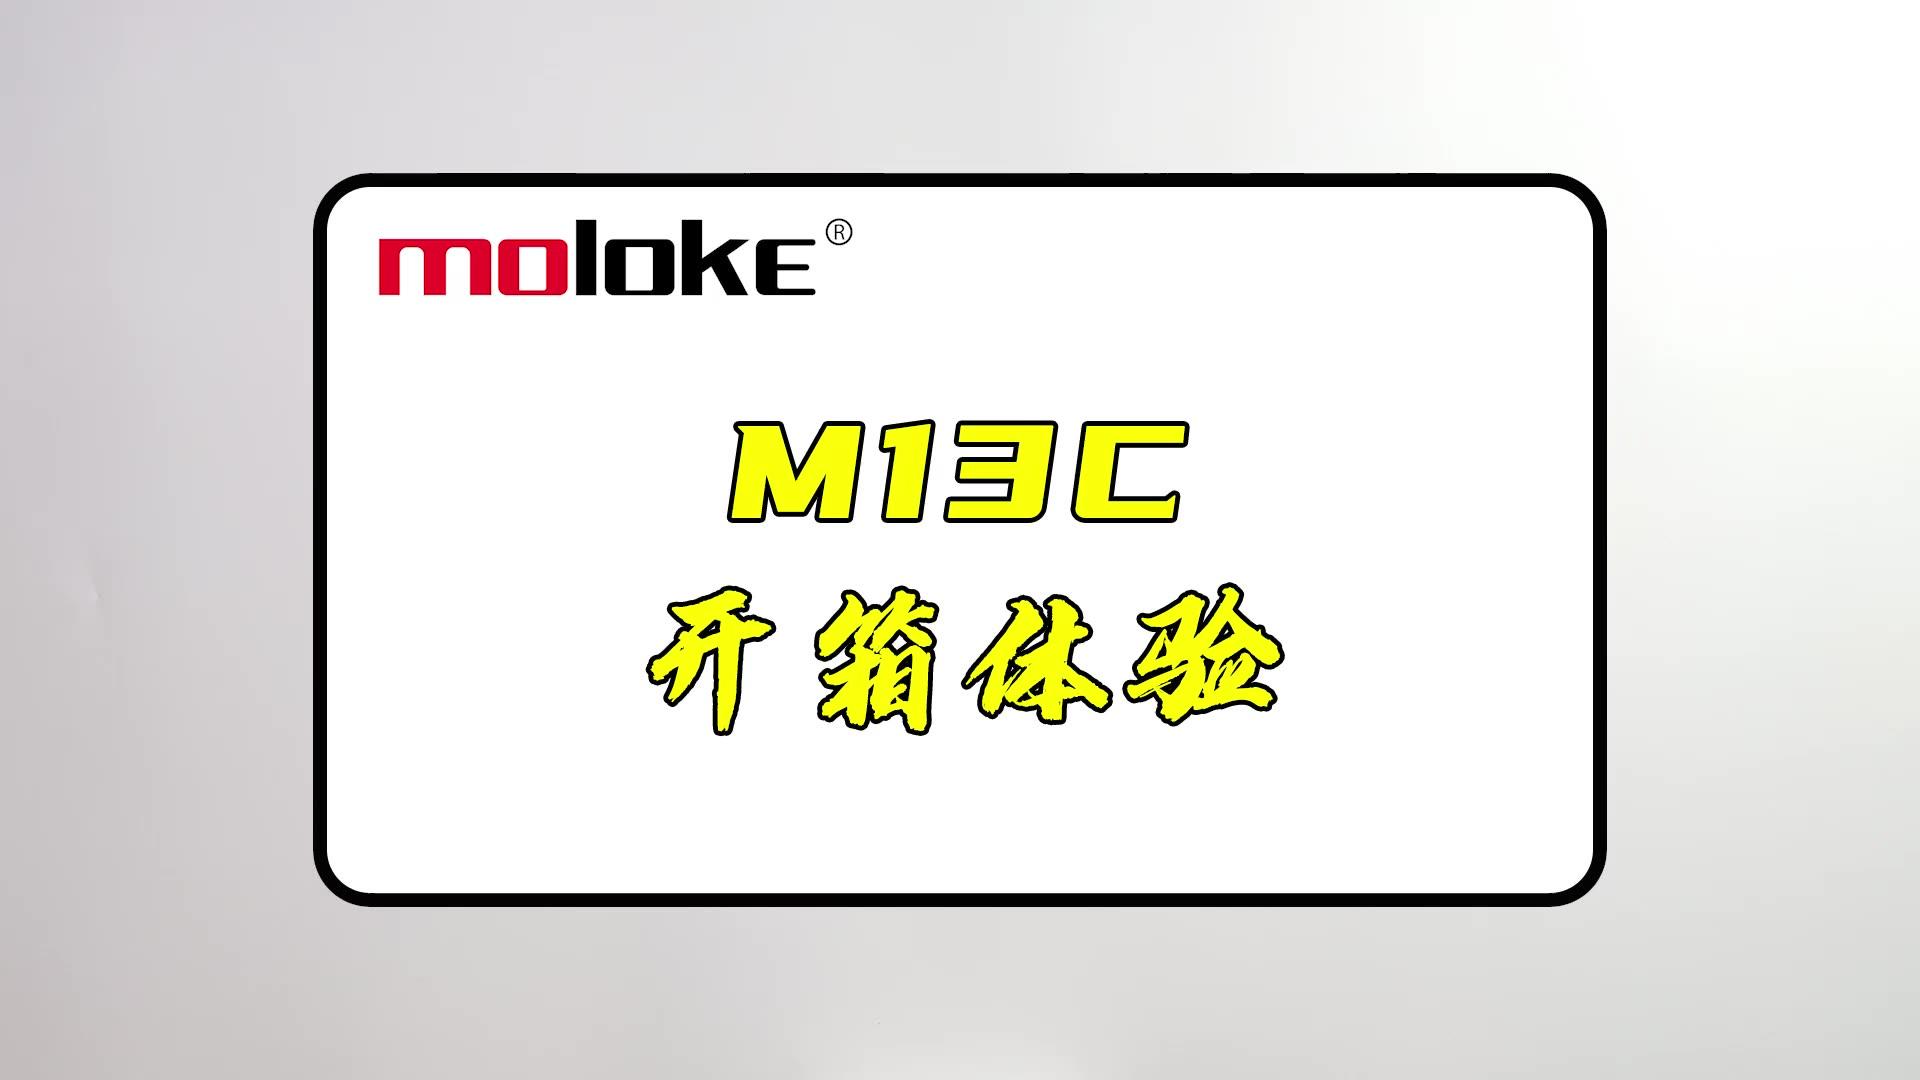 M13c Touch Control 5.0 Sport LED  True TWS  Headsets Wireless Earbuds Earphone & Headphone Bluetooth Earphone With Power  Bank